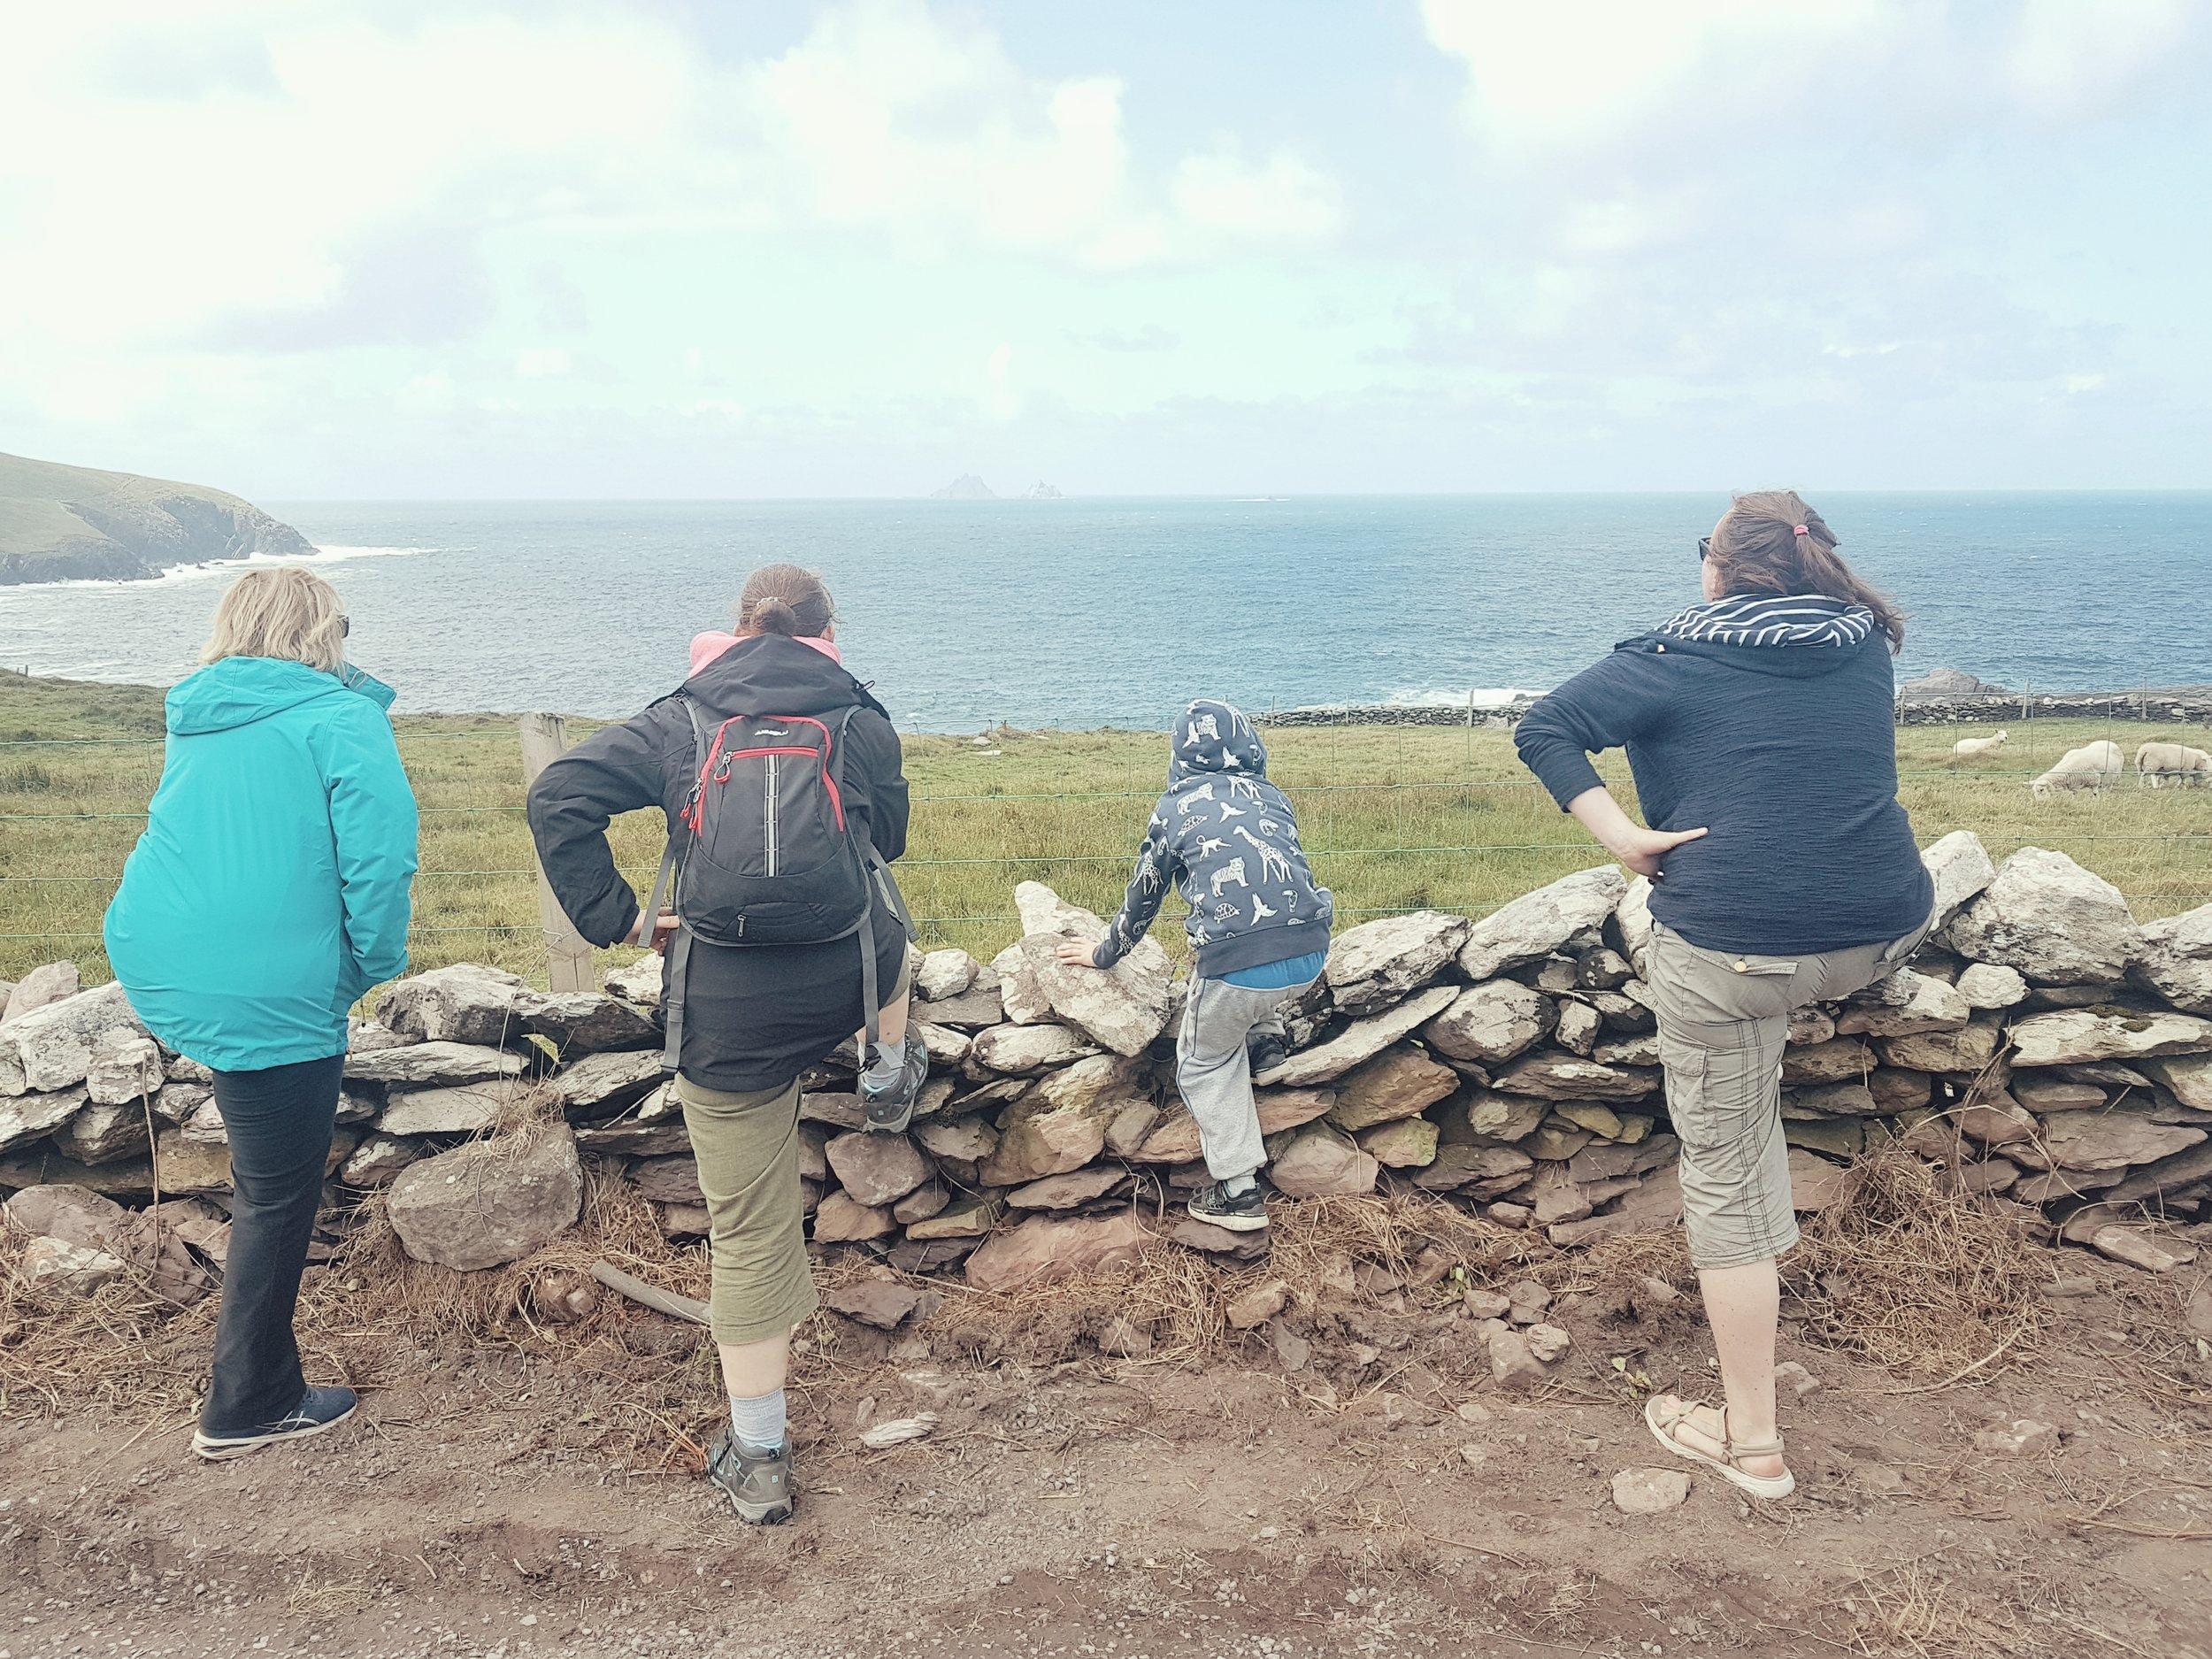 Ireland. Wild Atlantic Way. Kerry. Counthy Kerry. Travel photography. Landscape photography. Blog. Irish. Travelling Ireland. Ireland west coast. Wild Landscape. Trip. Vacation.  (16).jpg